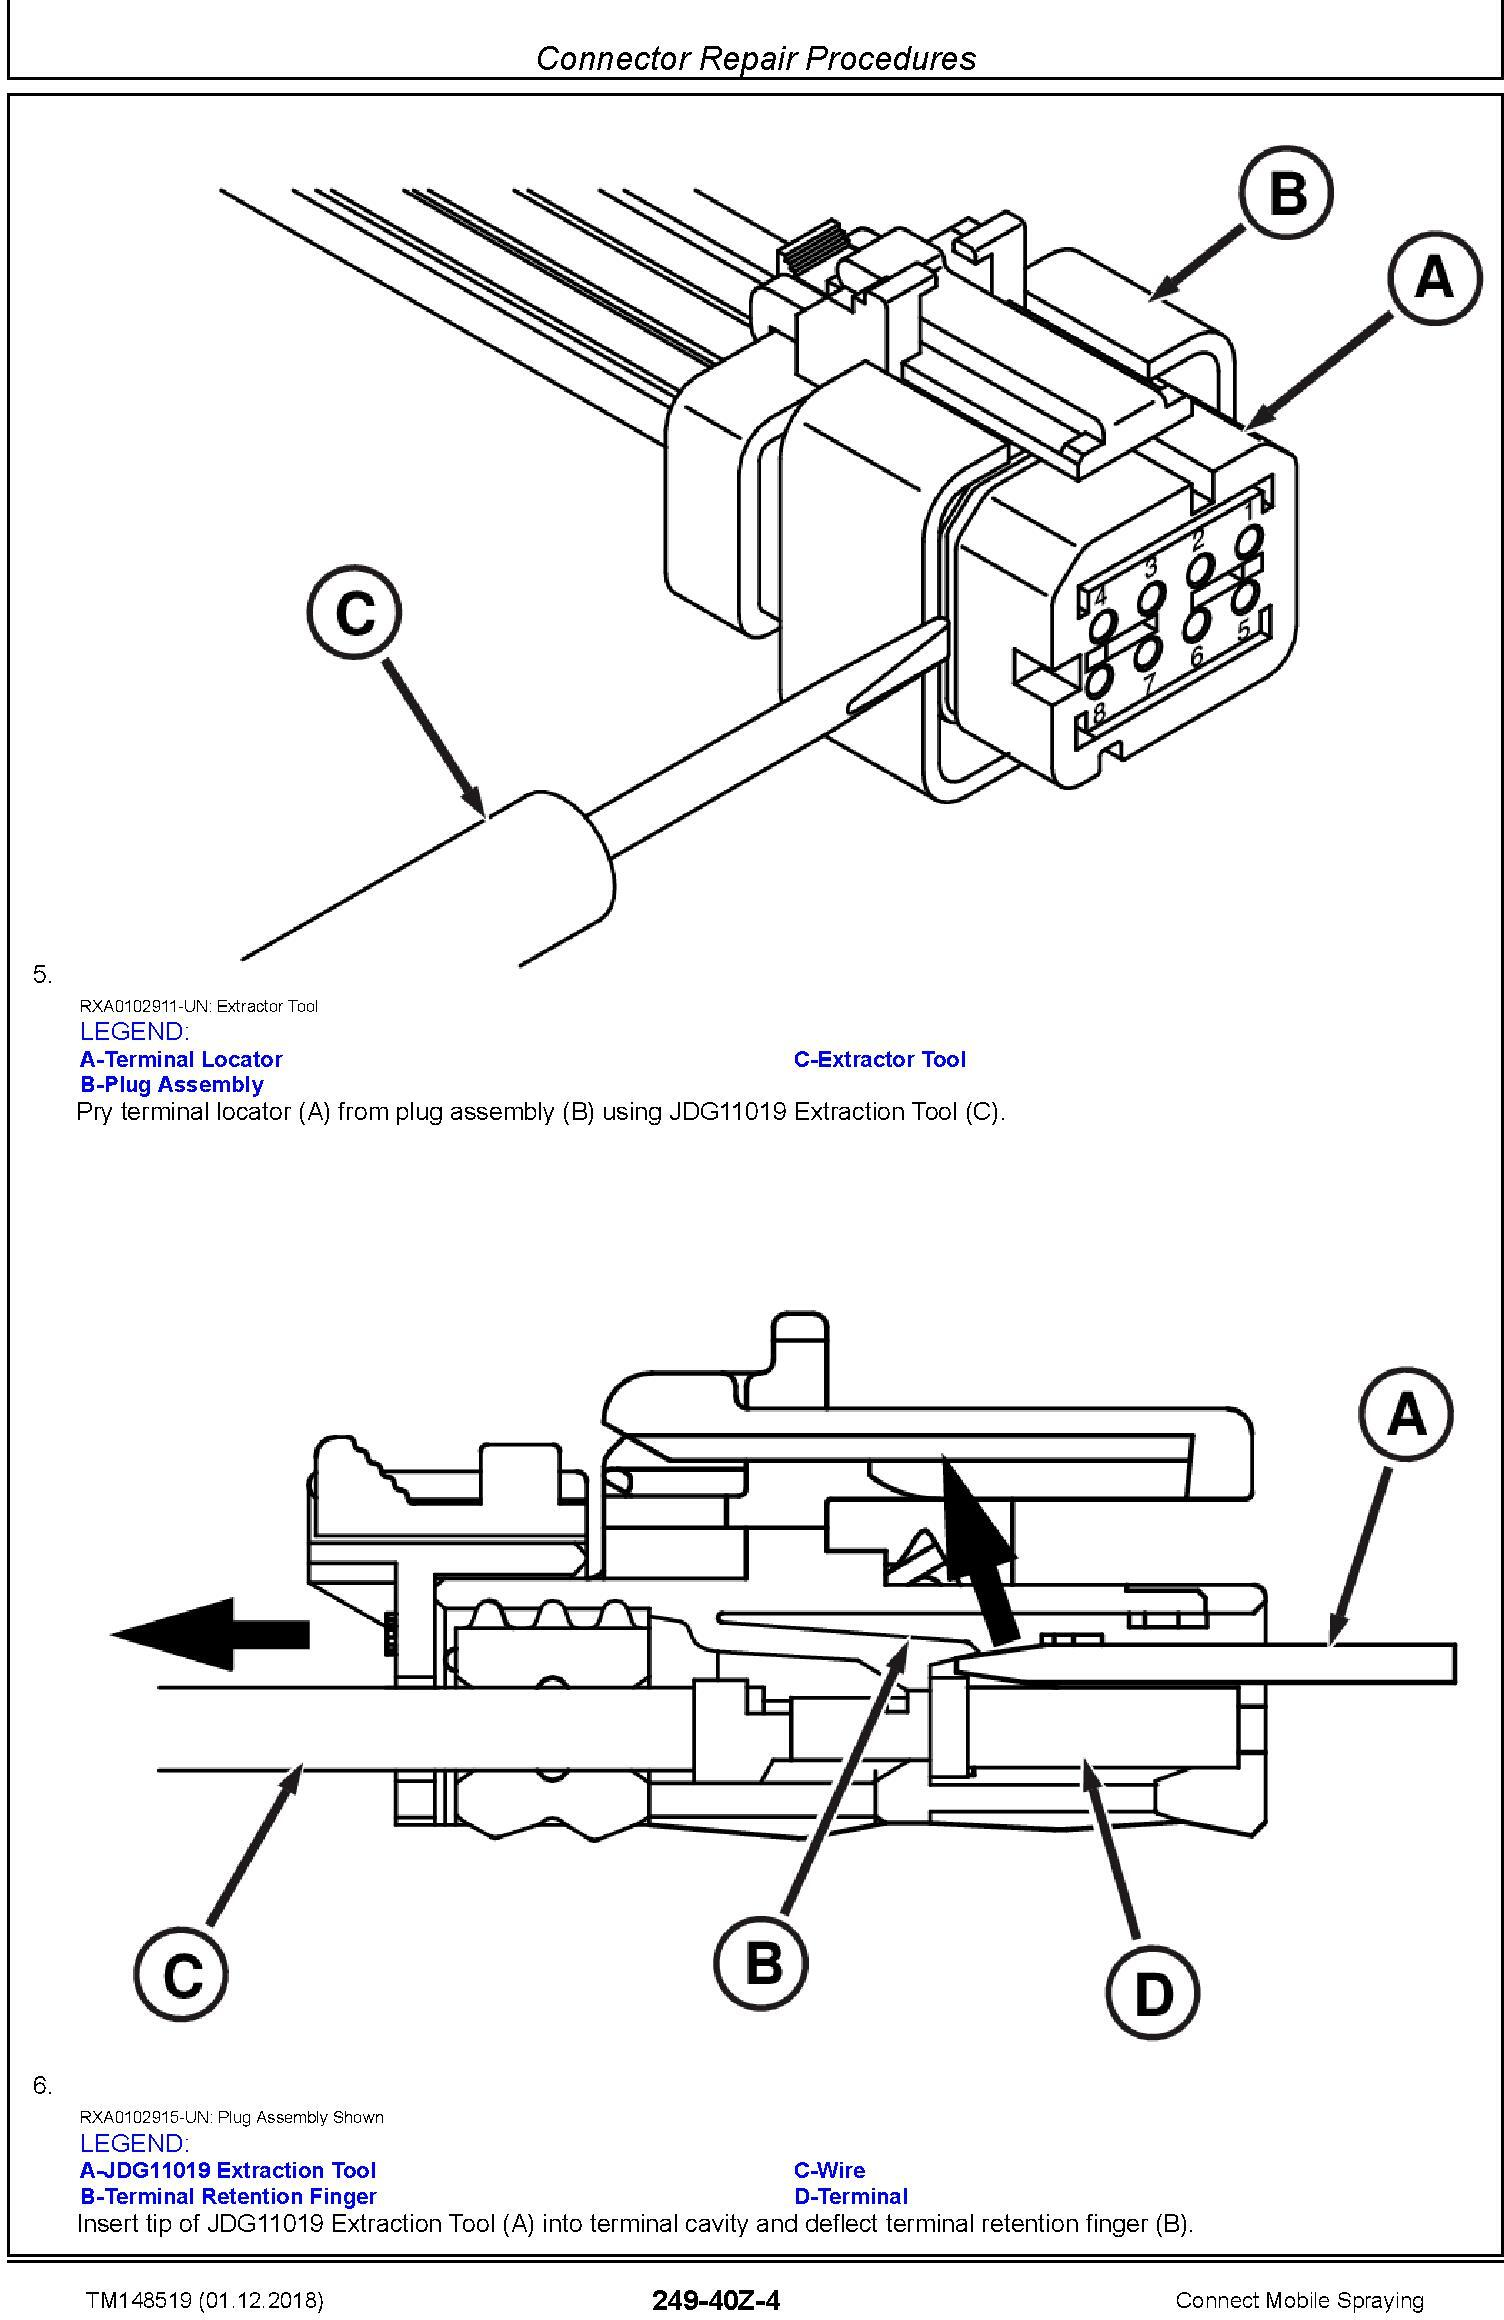 John Deere Connect Mobile Spraying Repair Technical